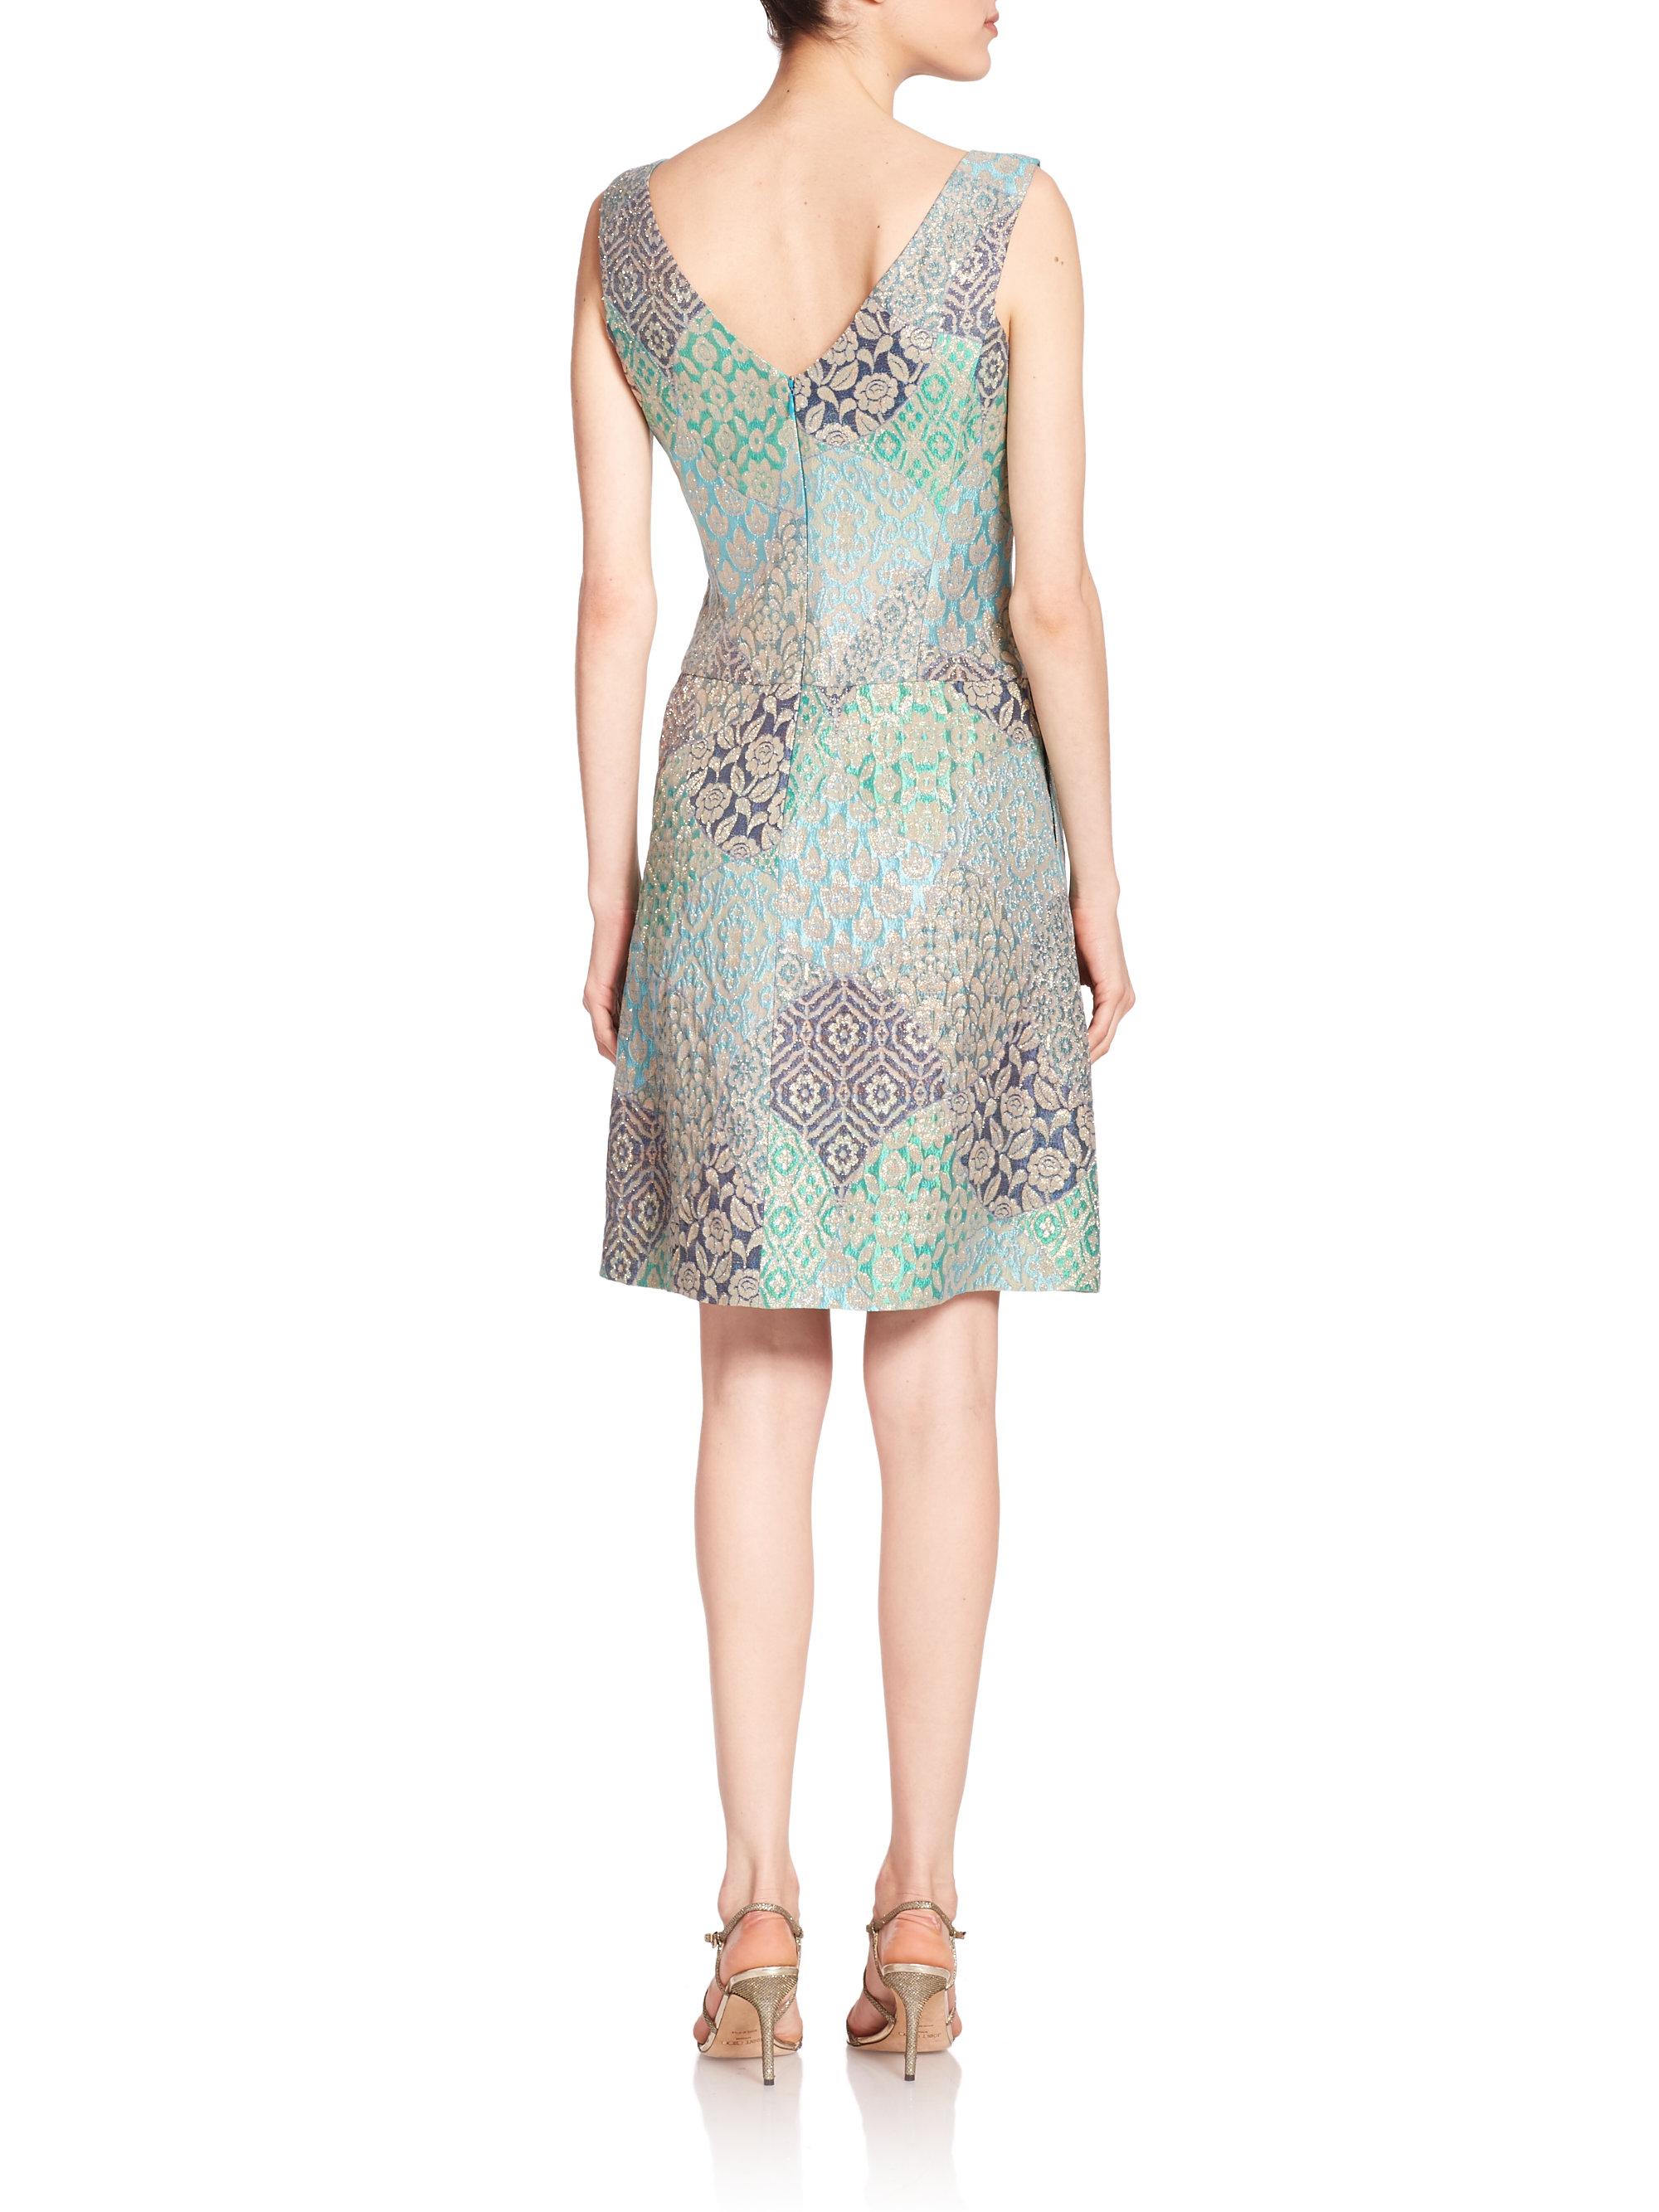 Kay Unger Metallic Jacquard Fit Amp Flare Dress Lyst